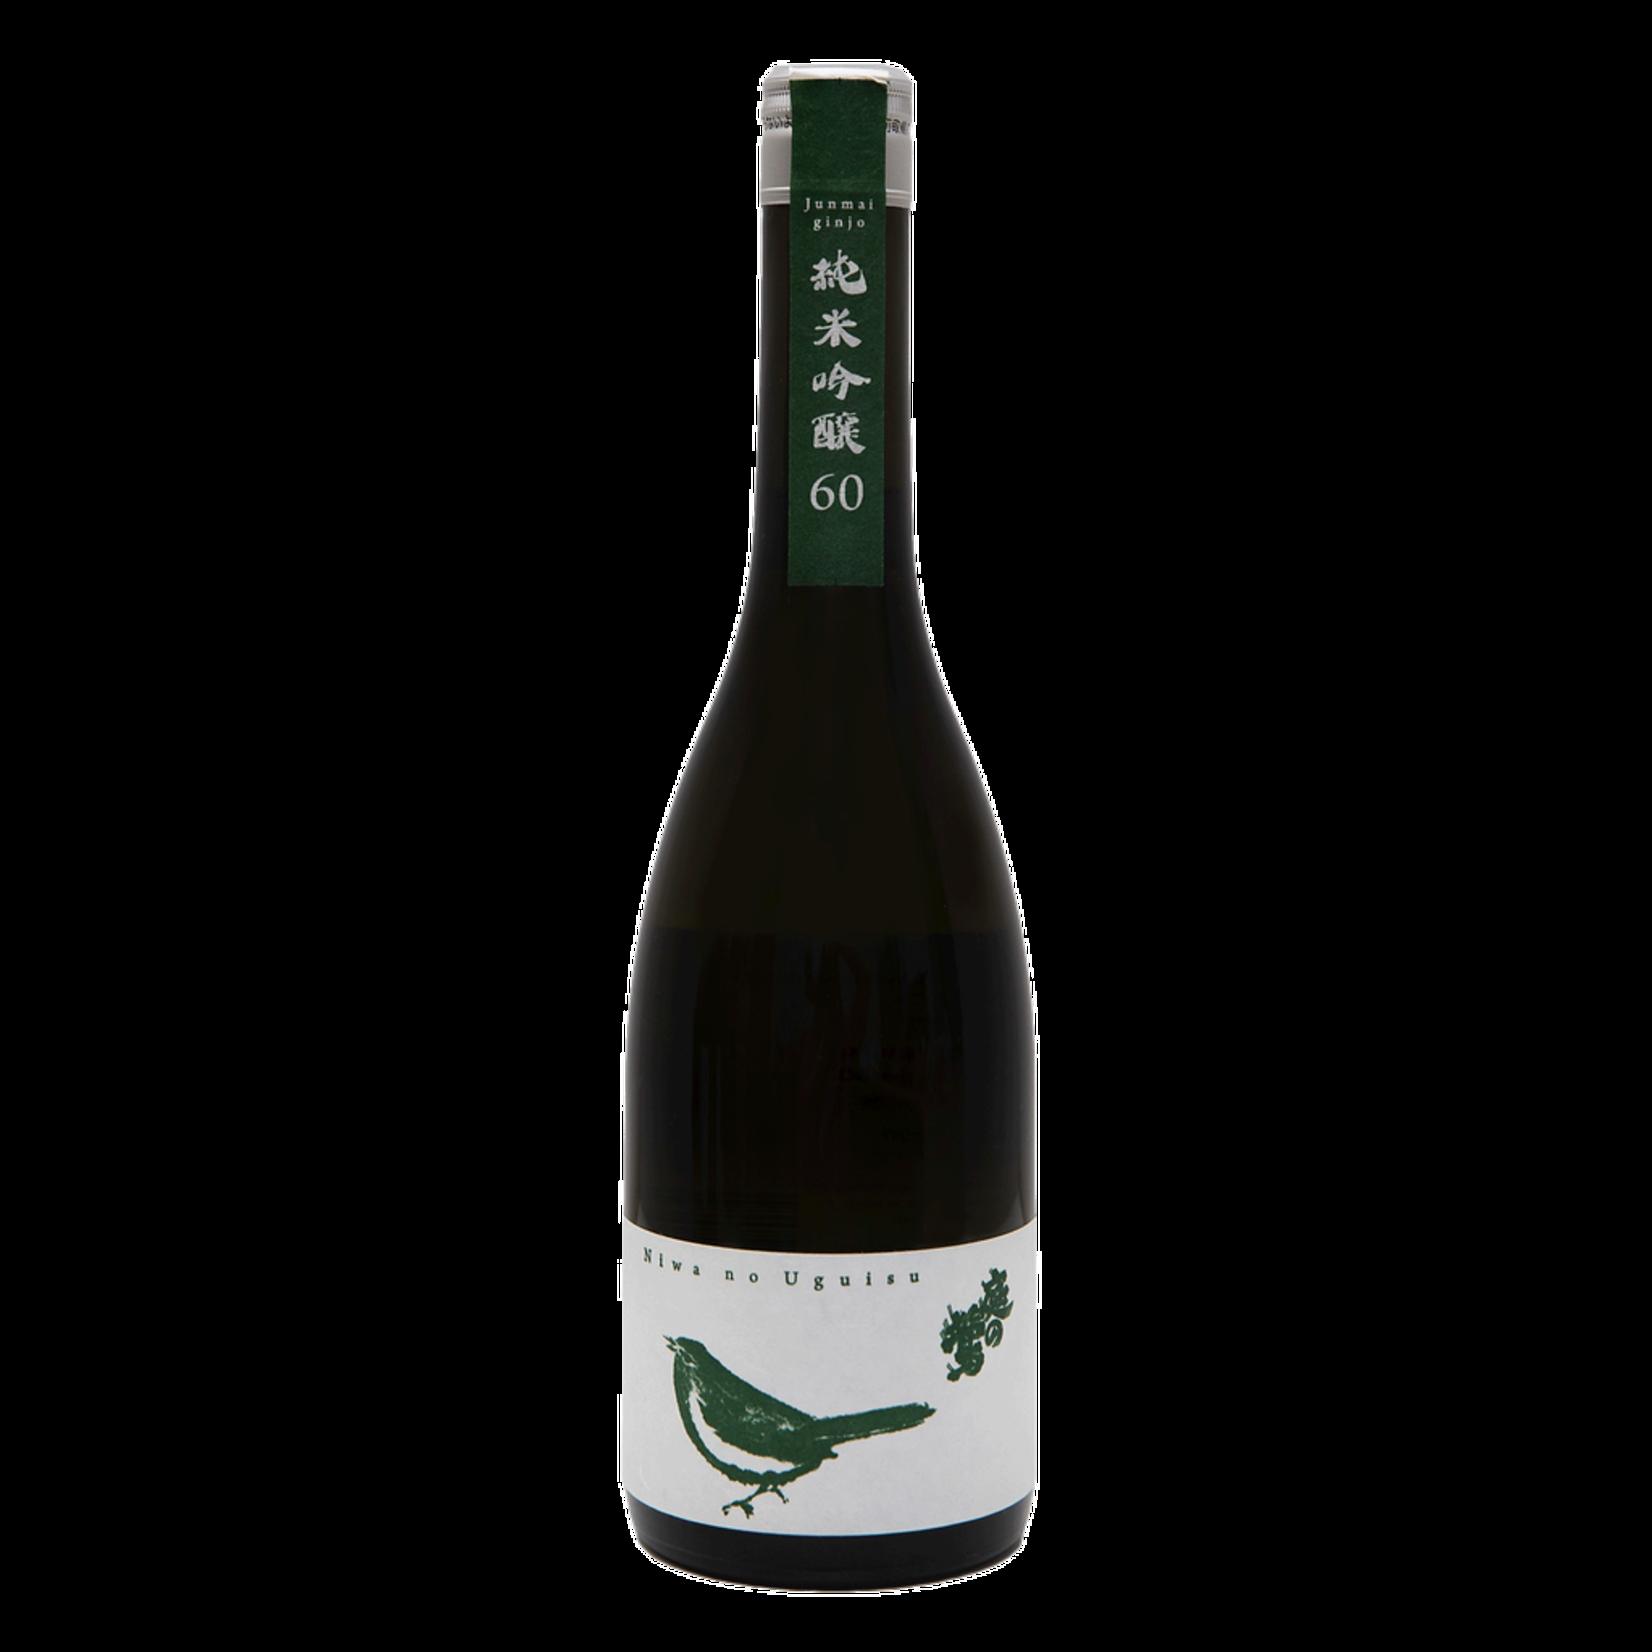 Sake Niwa No Uguisu 60 Junmai Ginjo Sake 300ml